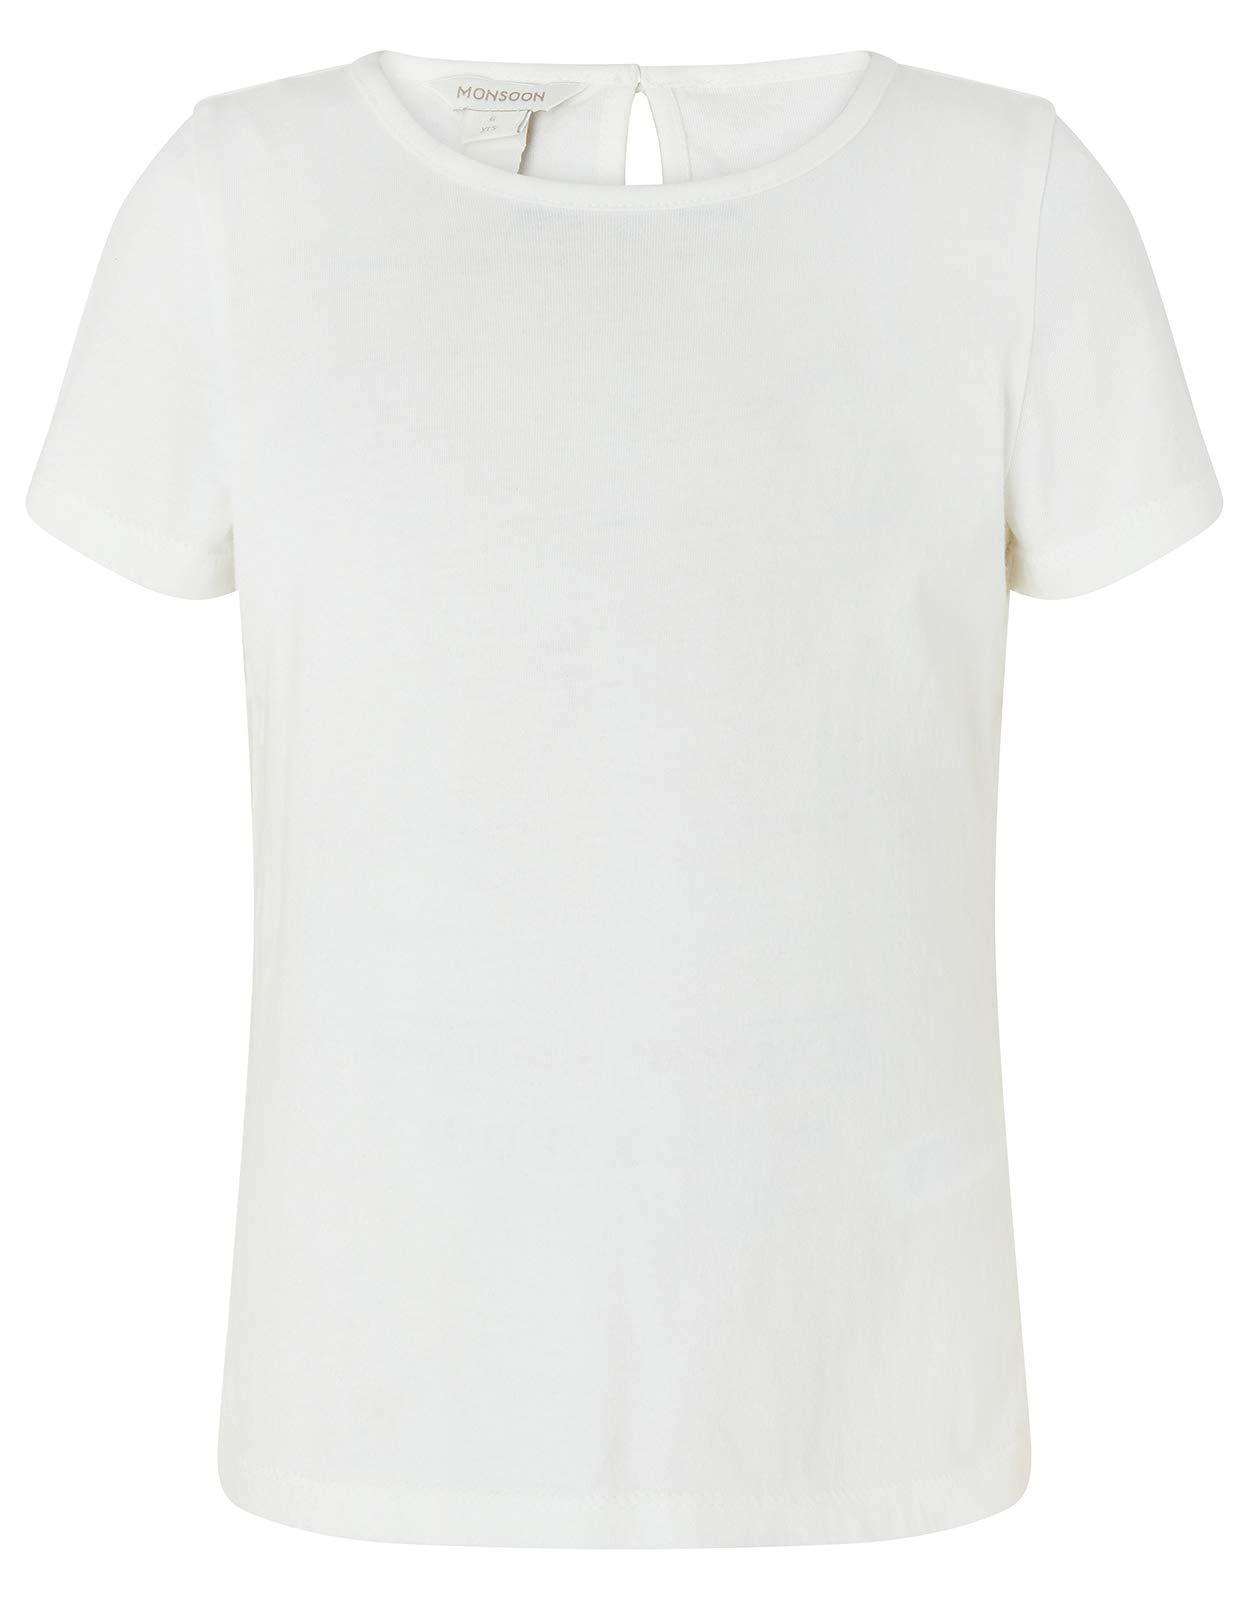 Monsoon Linen Blend Peta Romper & T-Shirt Daywear Sets - Girls - 9 Years Navy by Monsoon (Image #3)